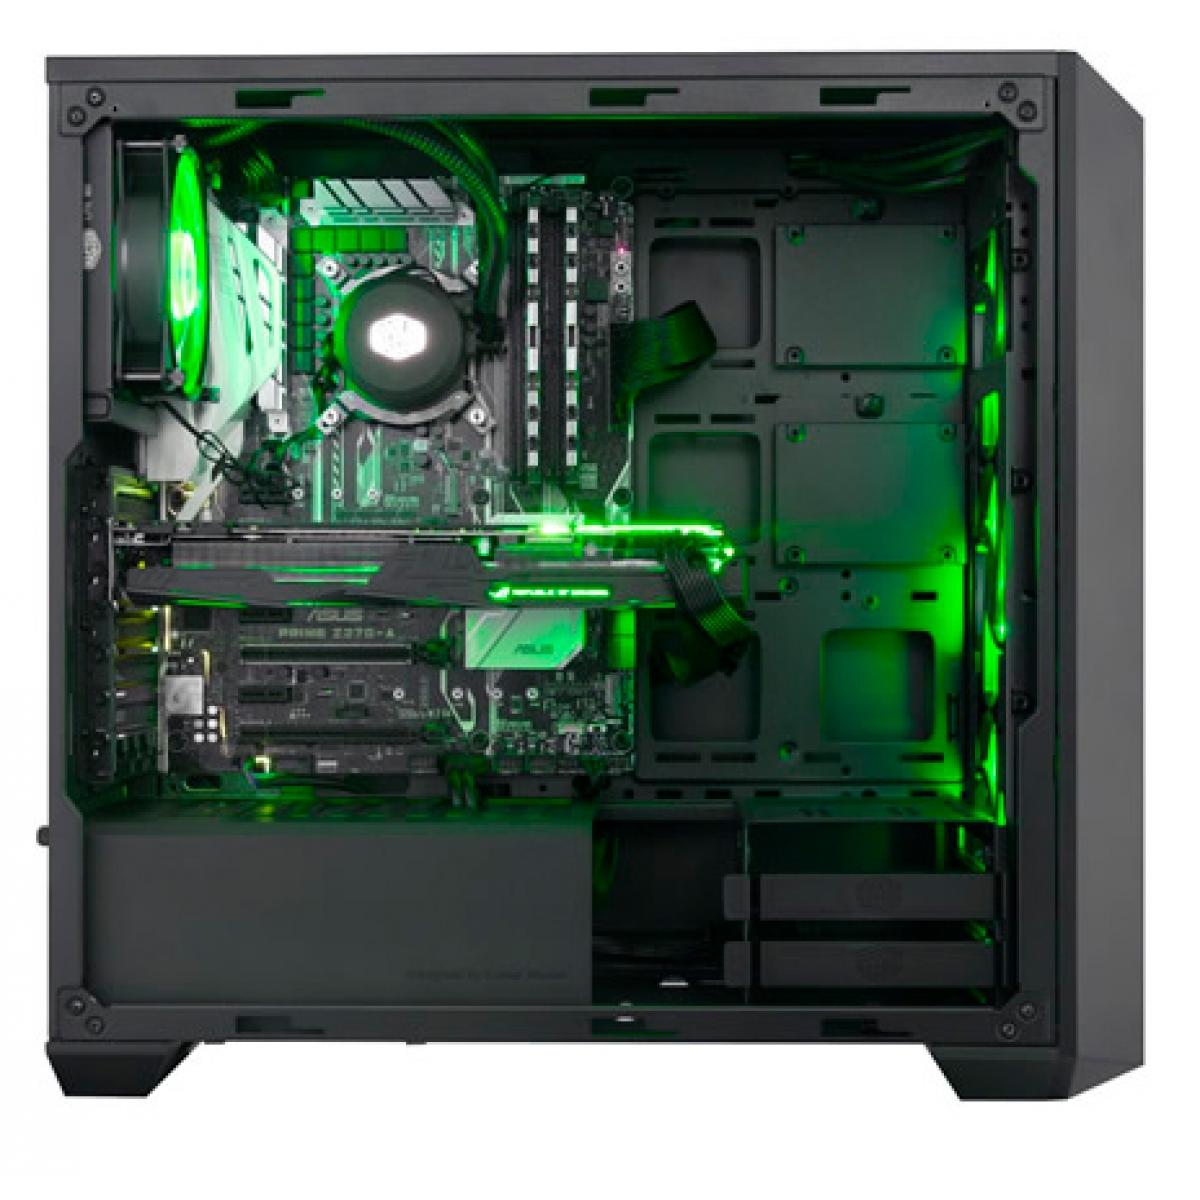 Gabinete Gamer Cooler Master MasterBox Pro 5 RGB, Mid Tower, Vidro Temperado, Black, Sem Fonte, Com 4 Fans, MCY-B5P2-KWGN-01